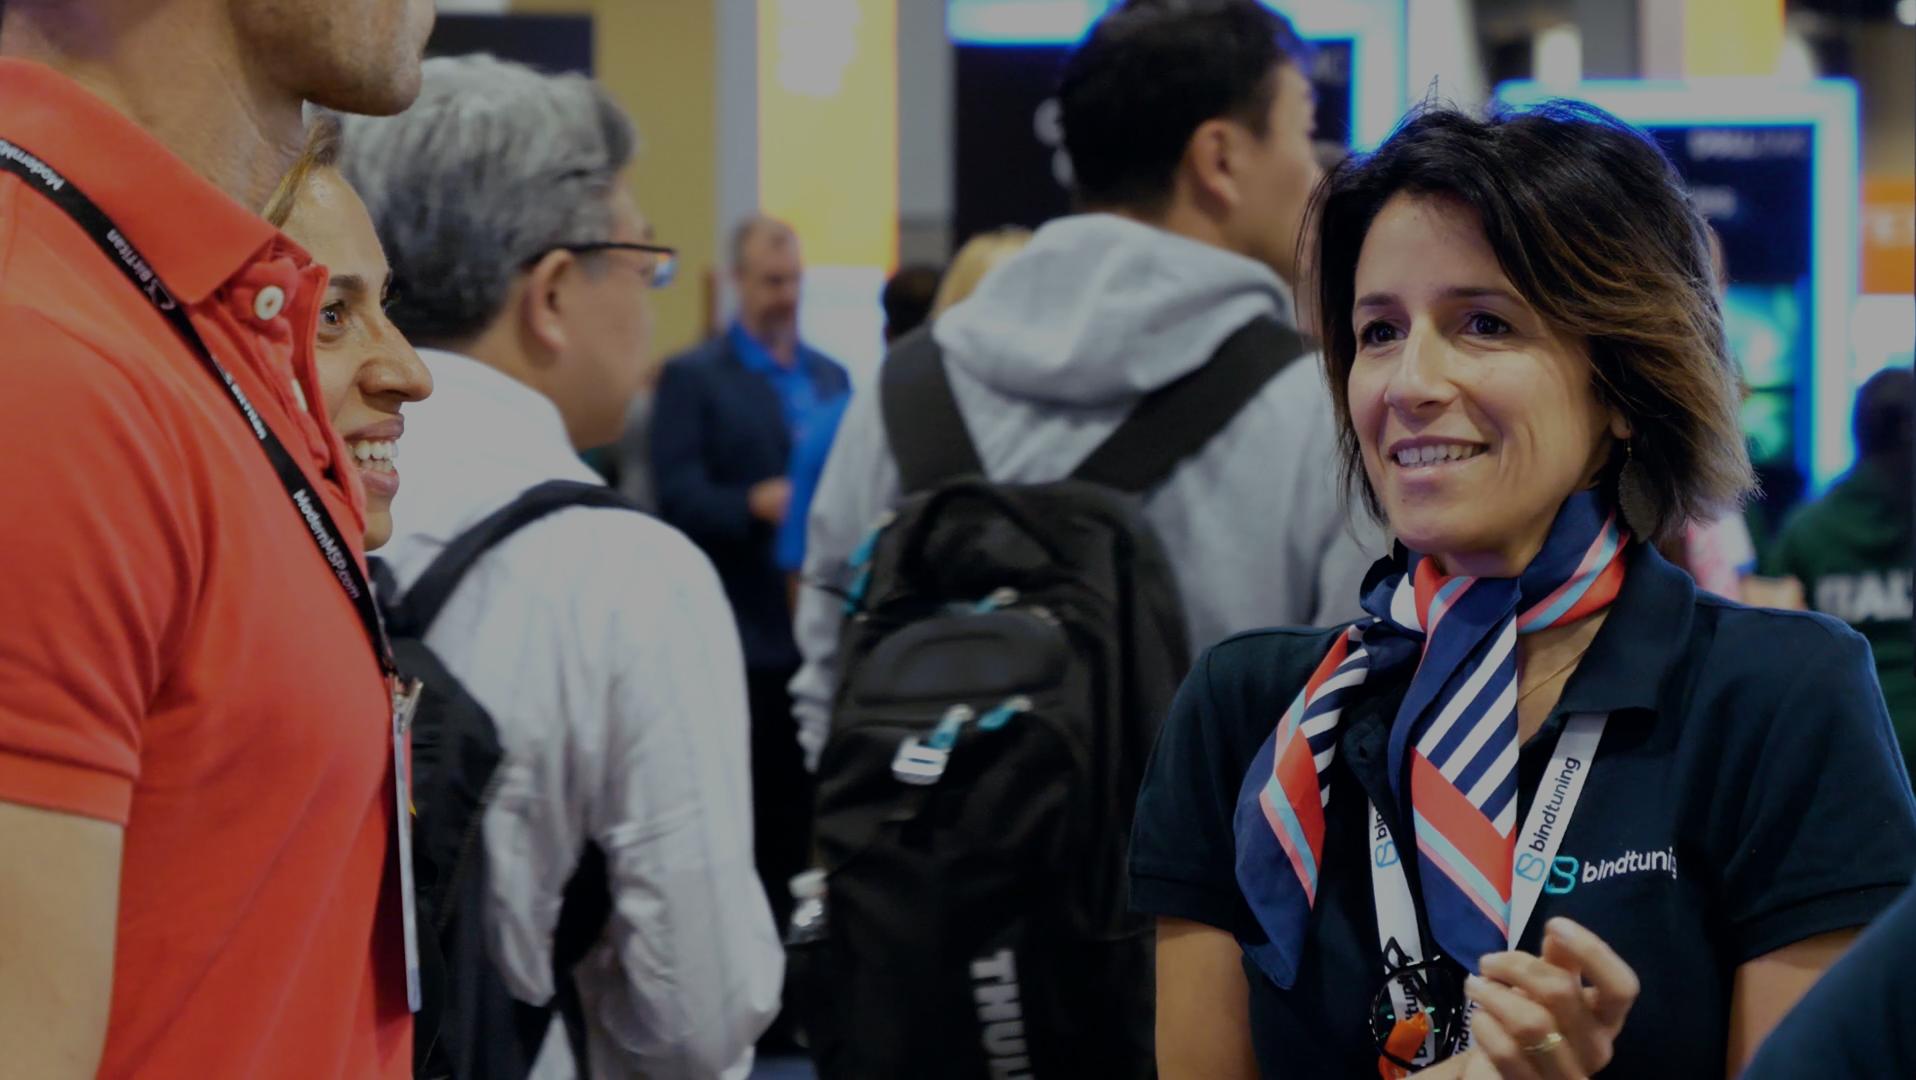 BindTuning at Microsoft Inspire 2017